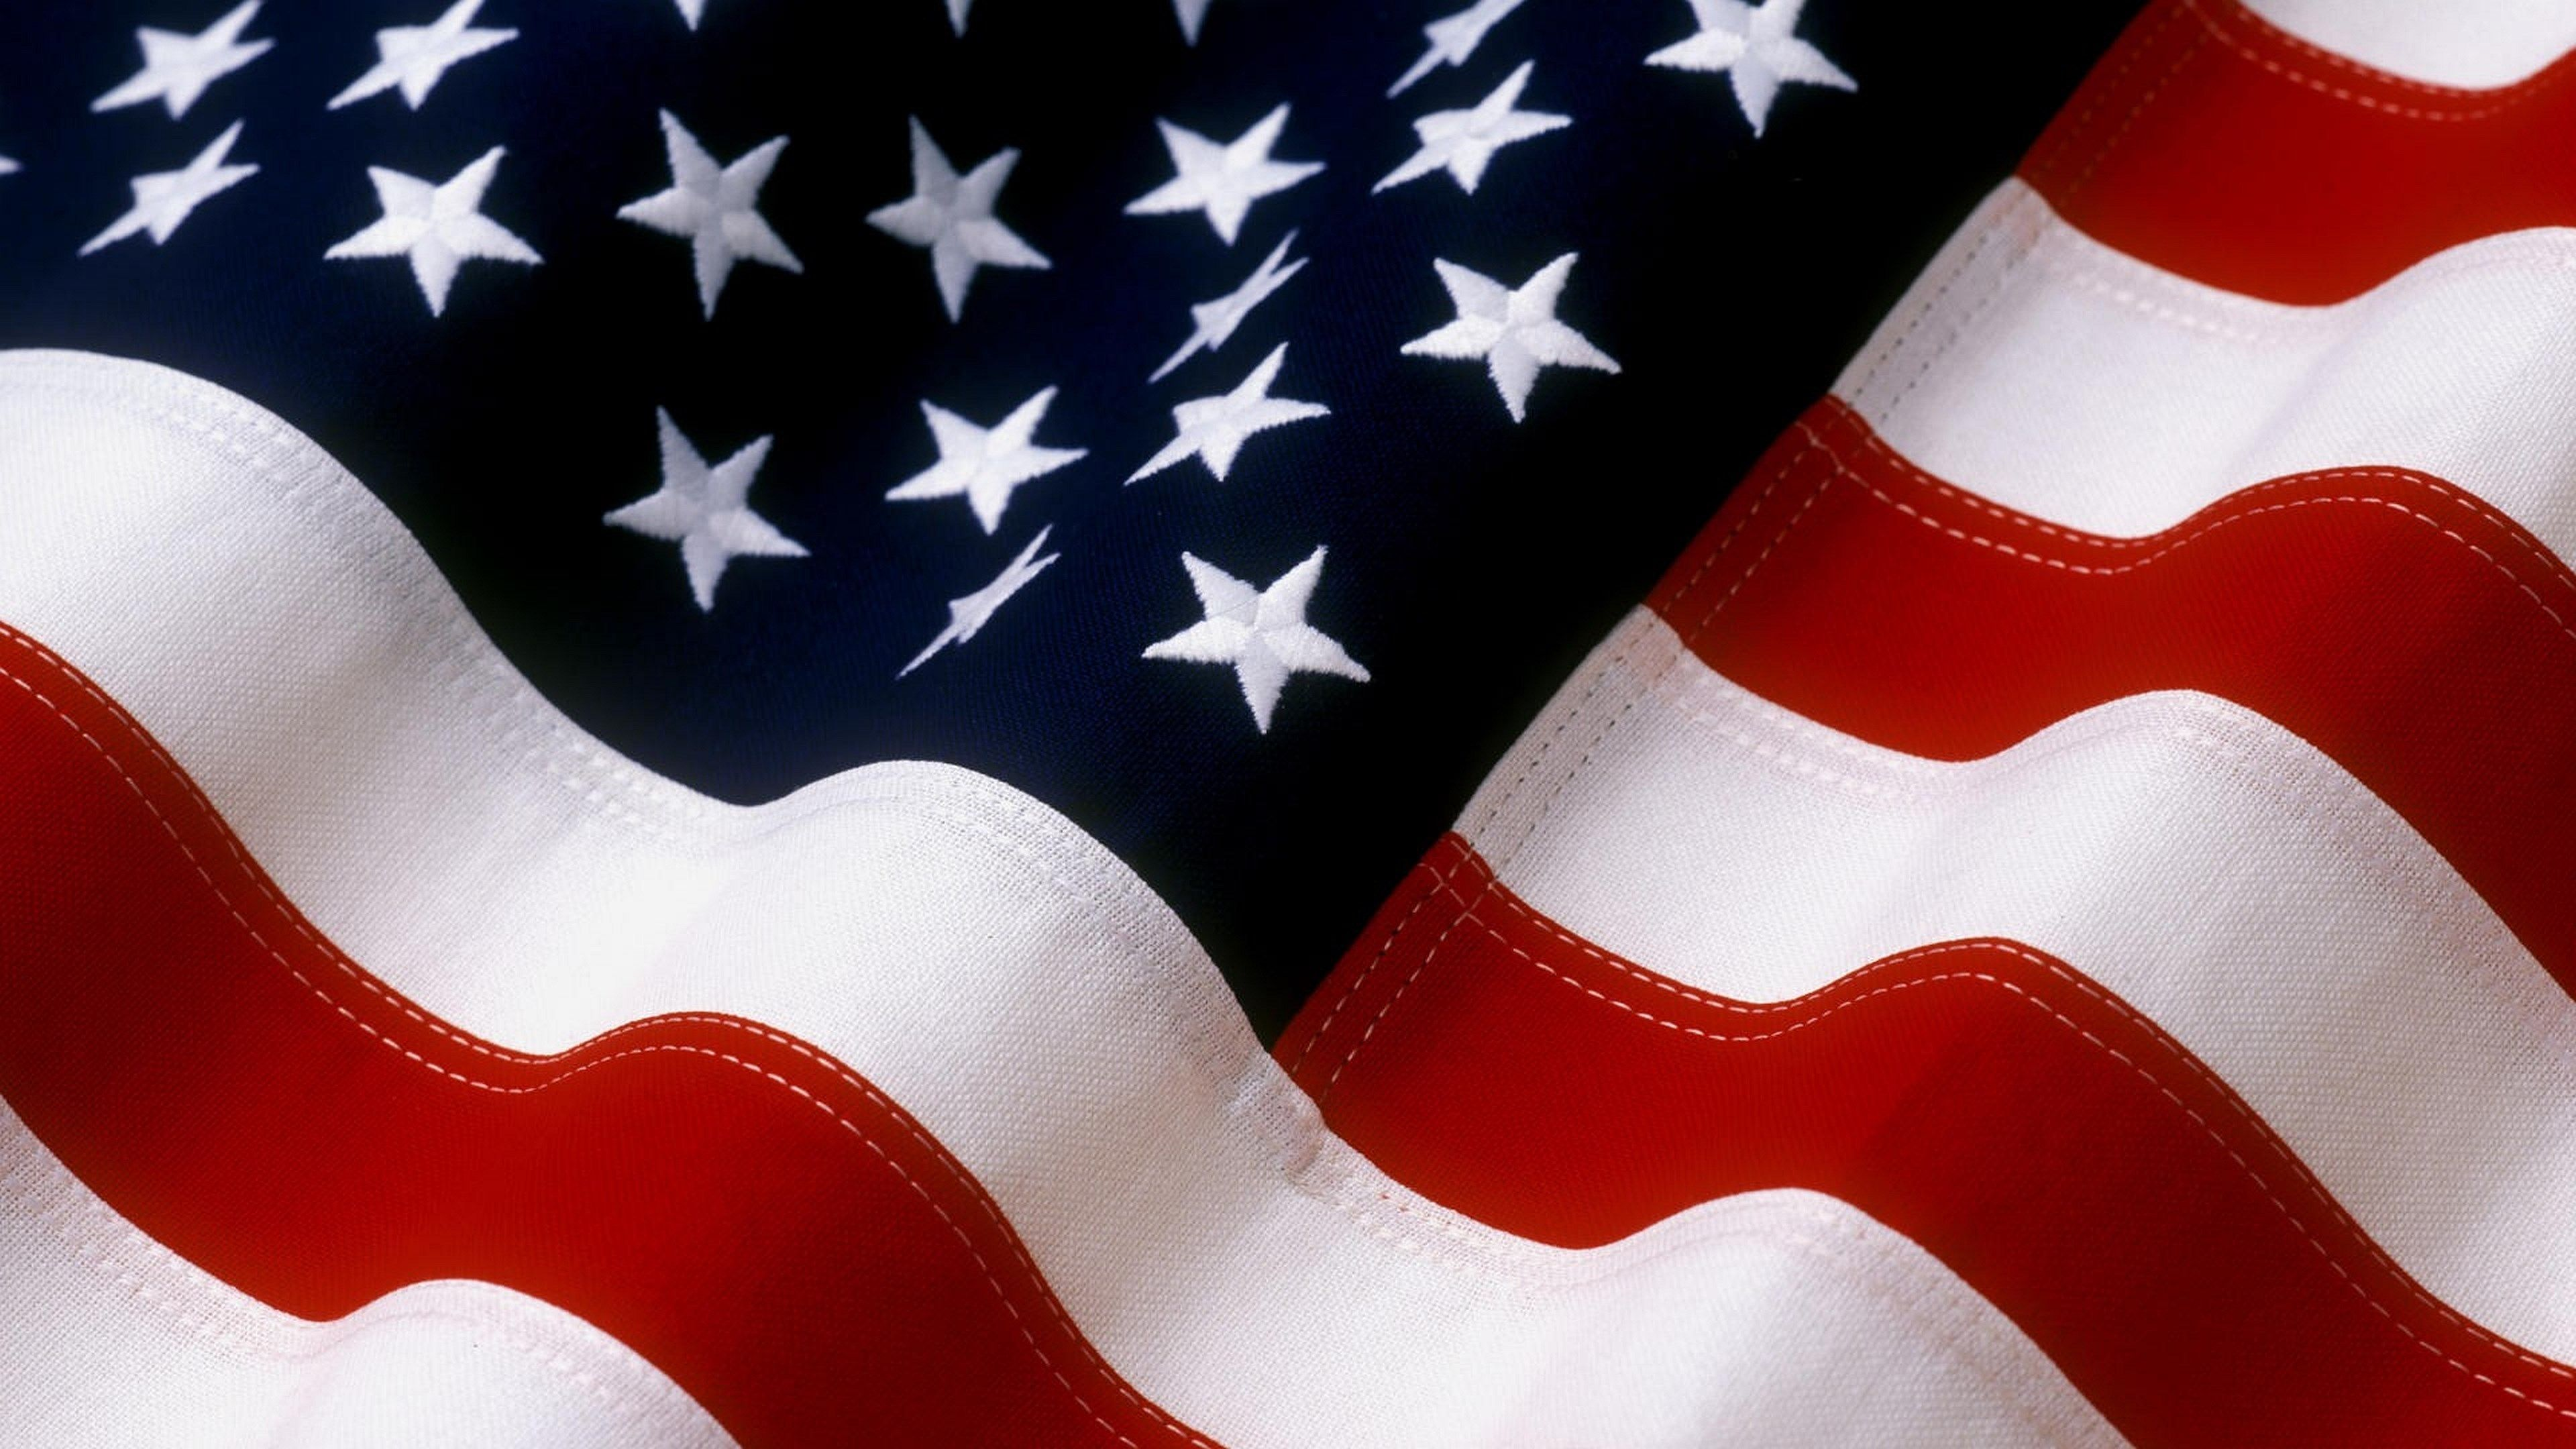 4k American Flag Hd Wallpaper 3840x2160